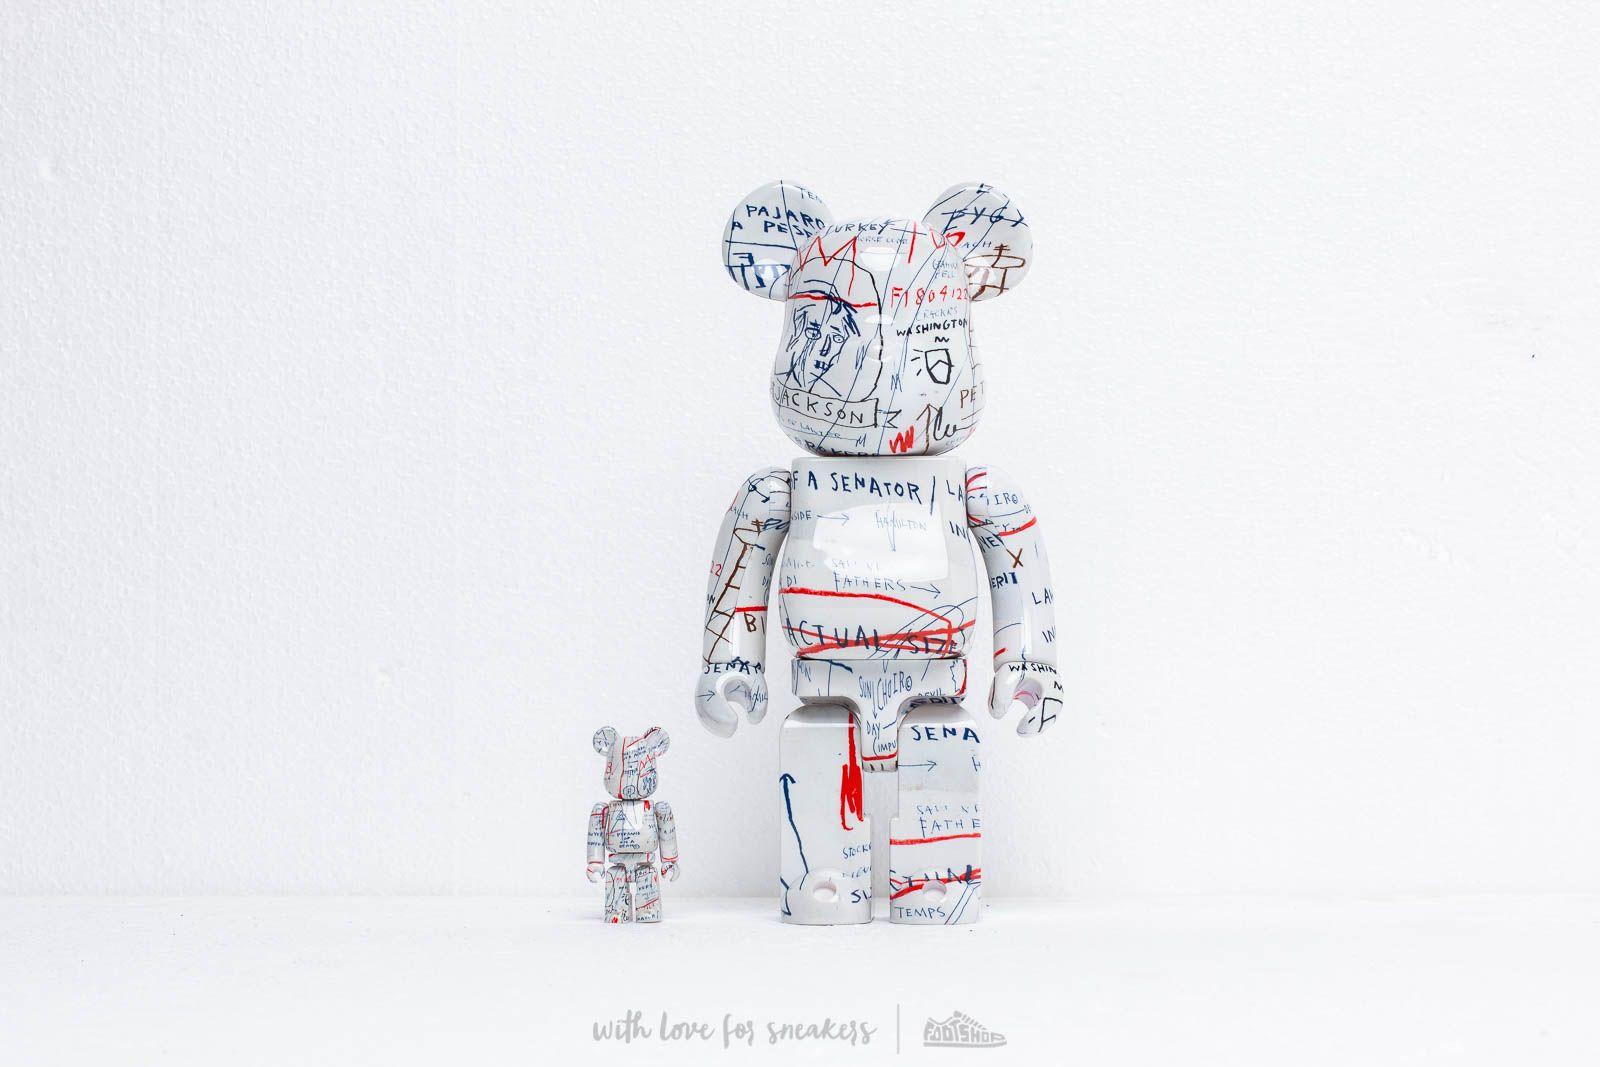 Medicom Toy Be@rBrick Jean-Michael Basquiat 100% & 400% Set